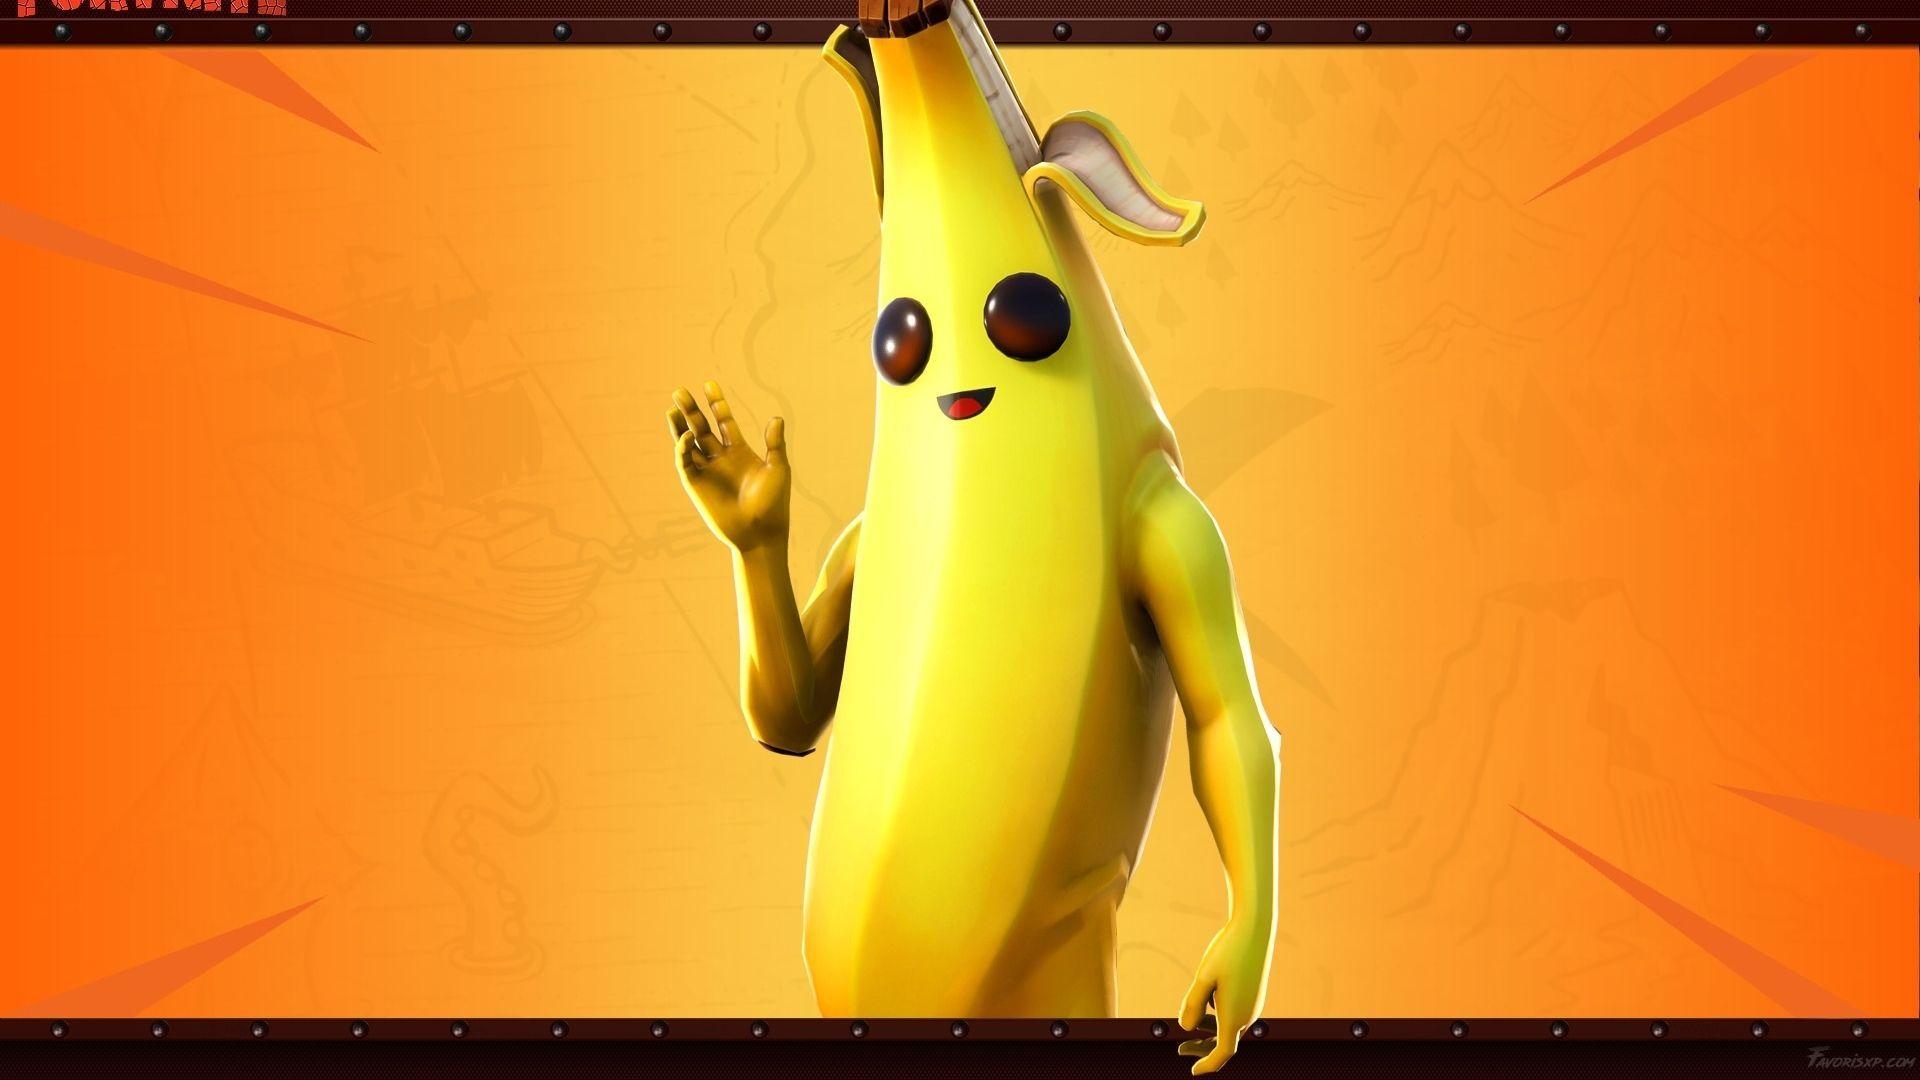 Banana no Fortnite